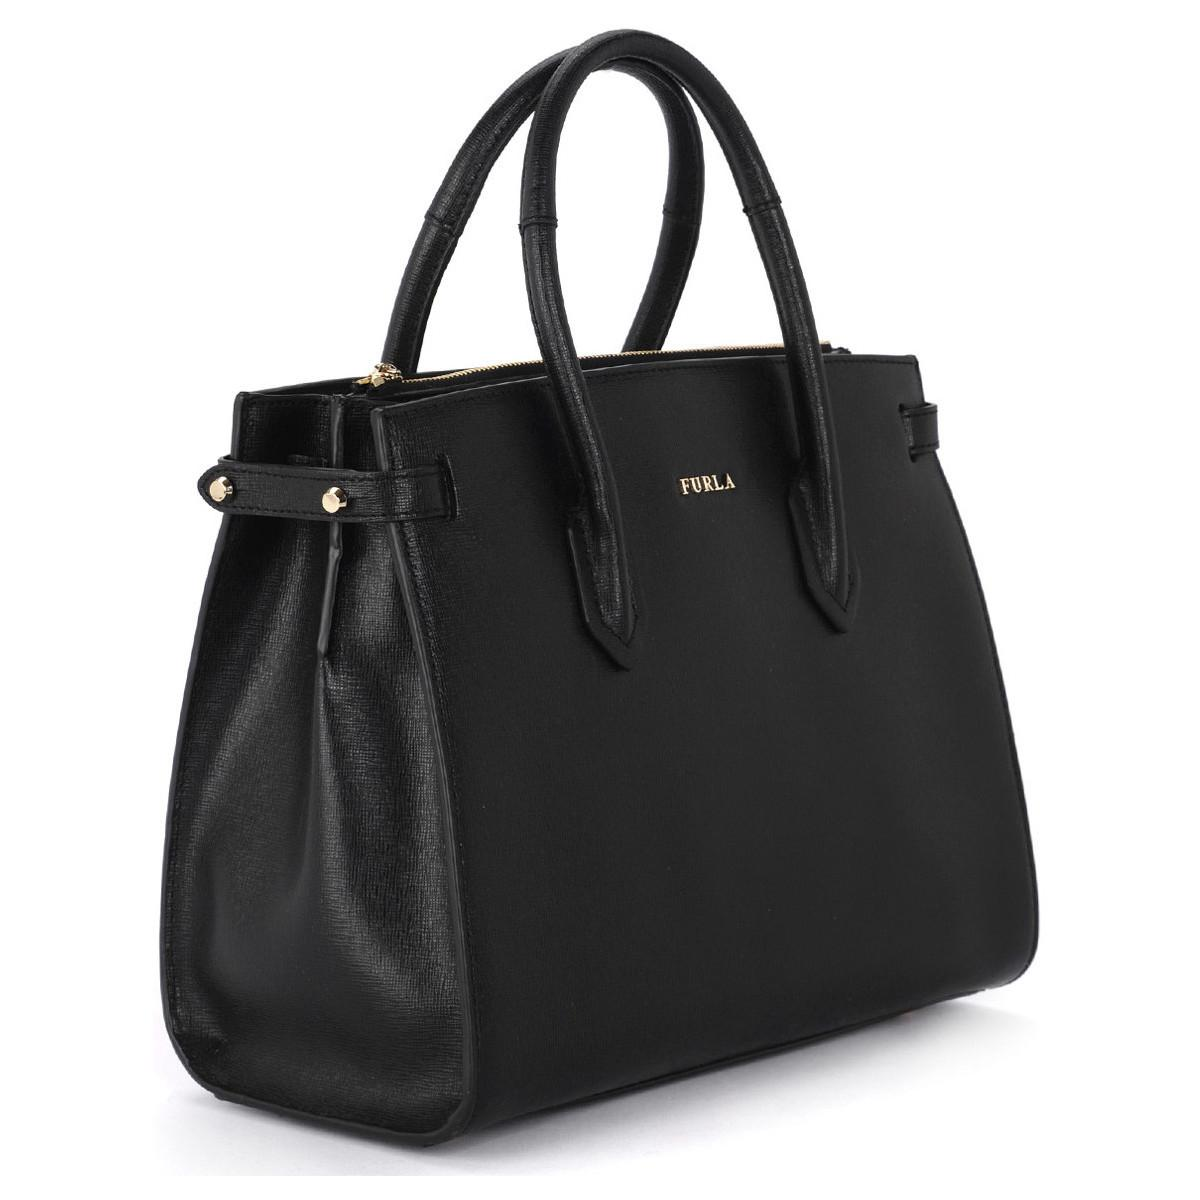 Furla Pin S Black Leather Handbag Women s Handbags In Black in Black ... 49ec94bbd7f